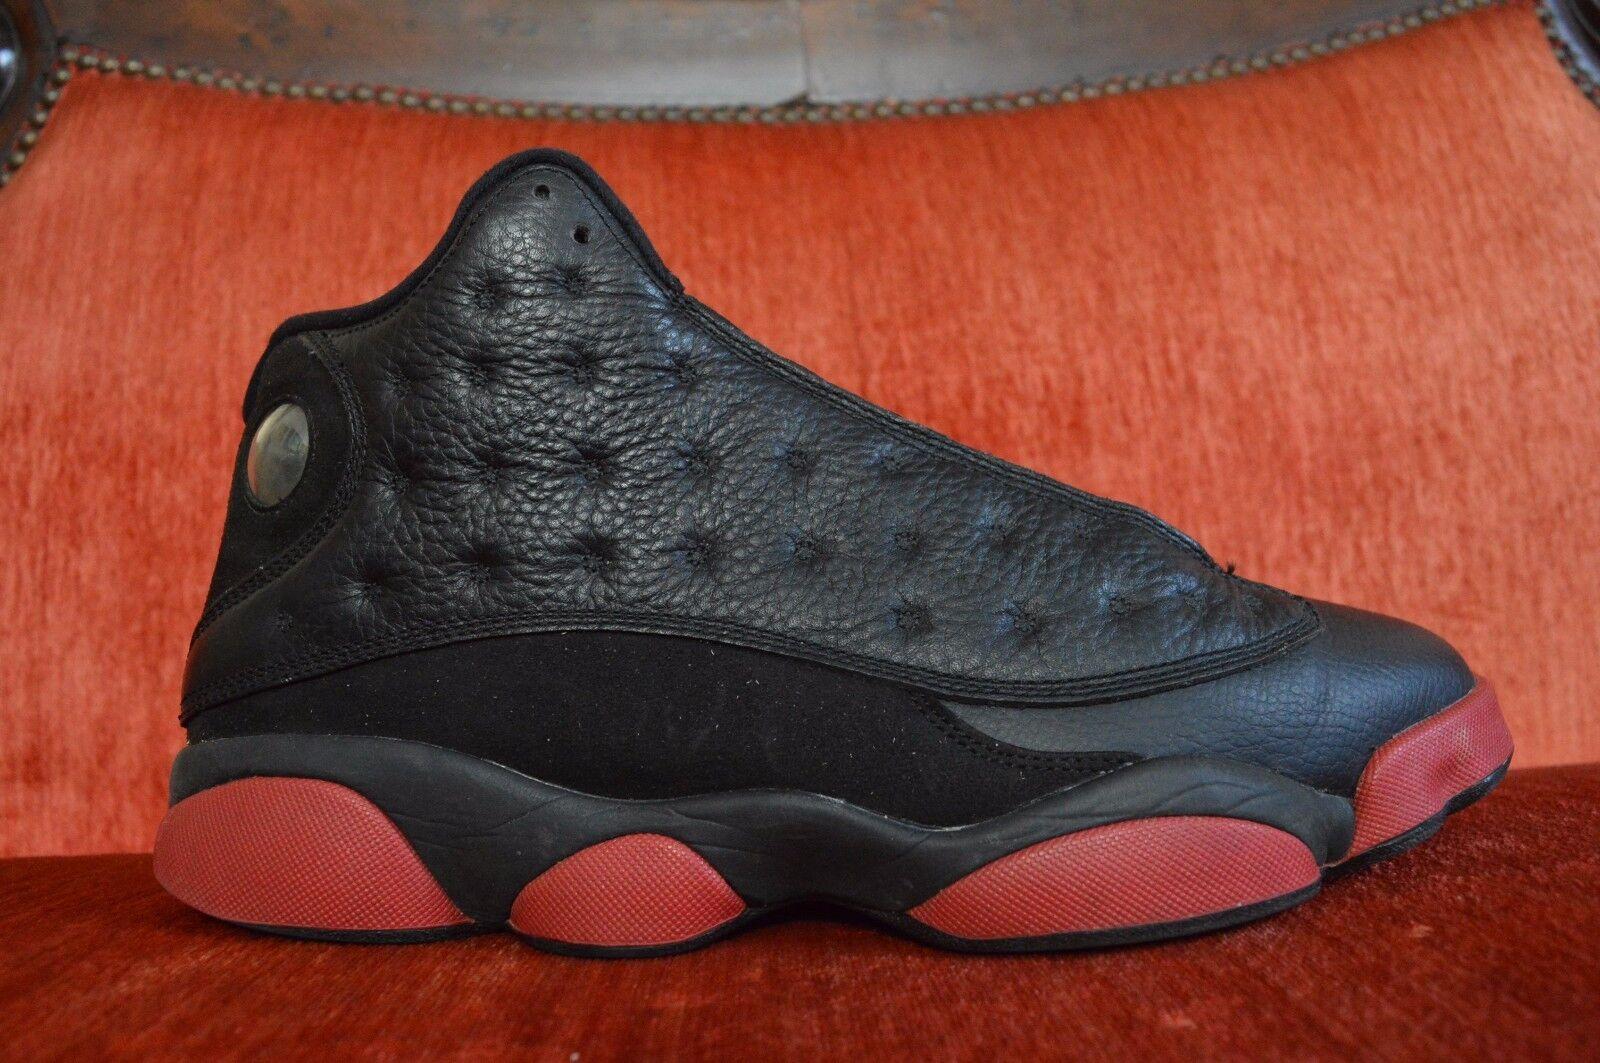 Nike air jordan 13 sporco generato grande palestra red xiii nero 414571 003 9 / 10